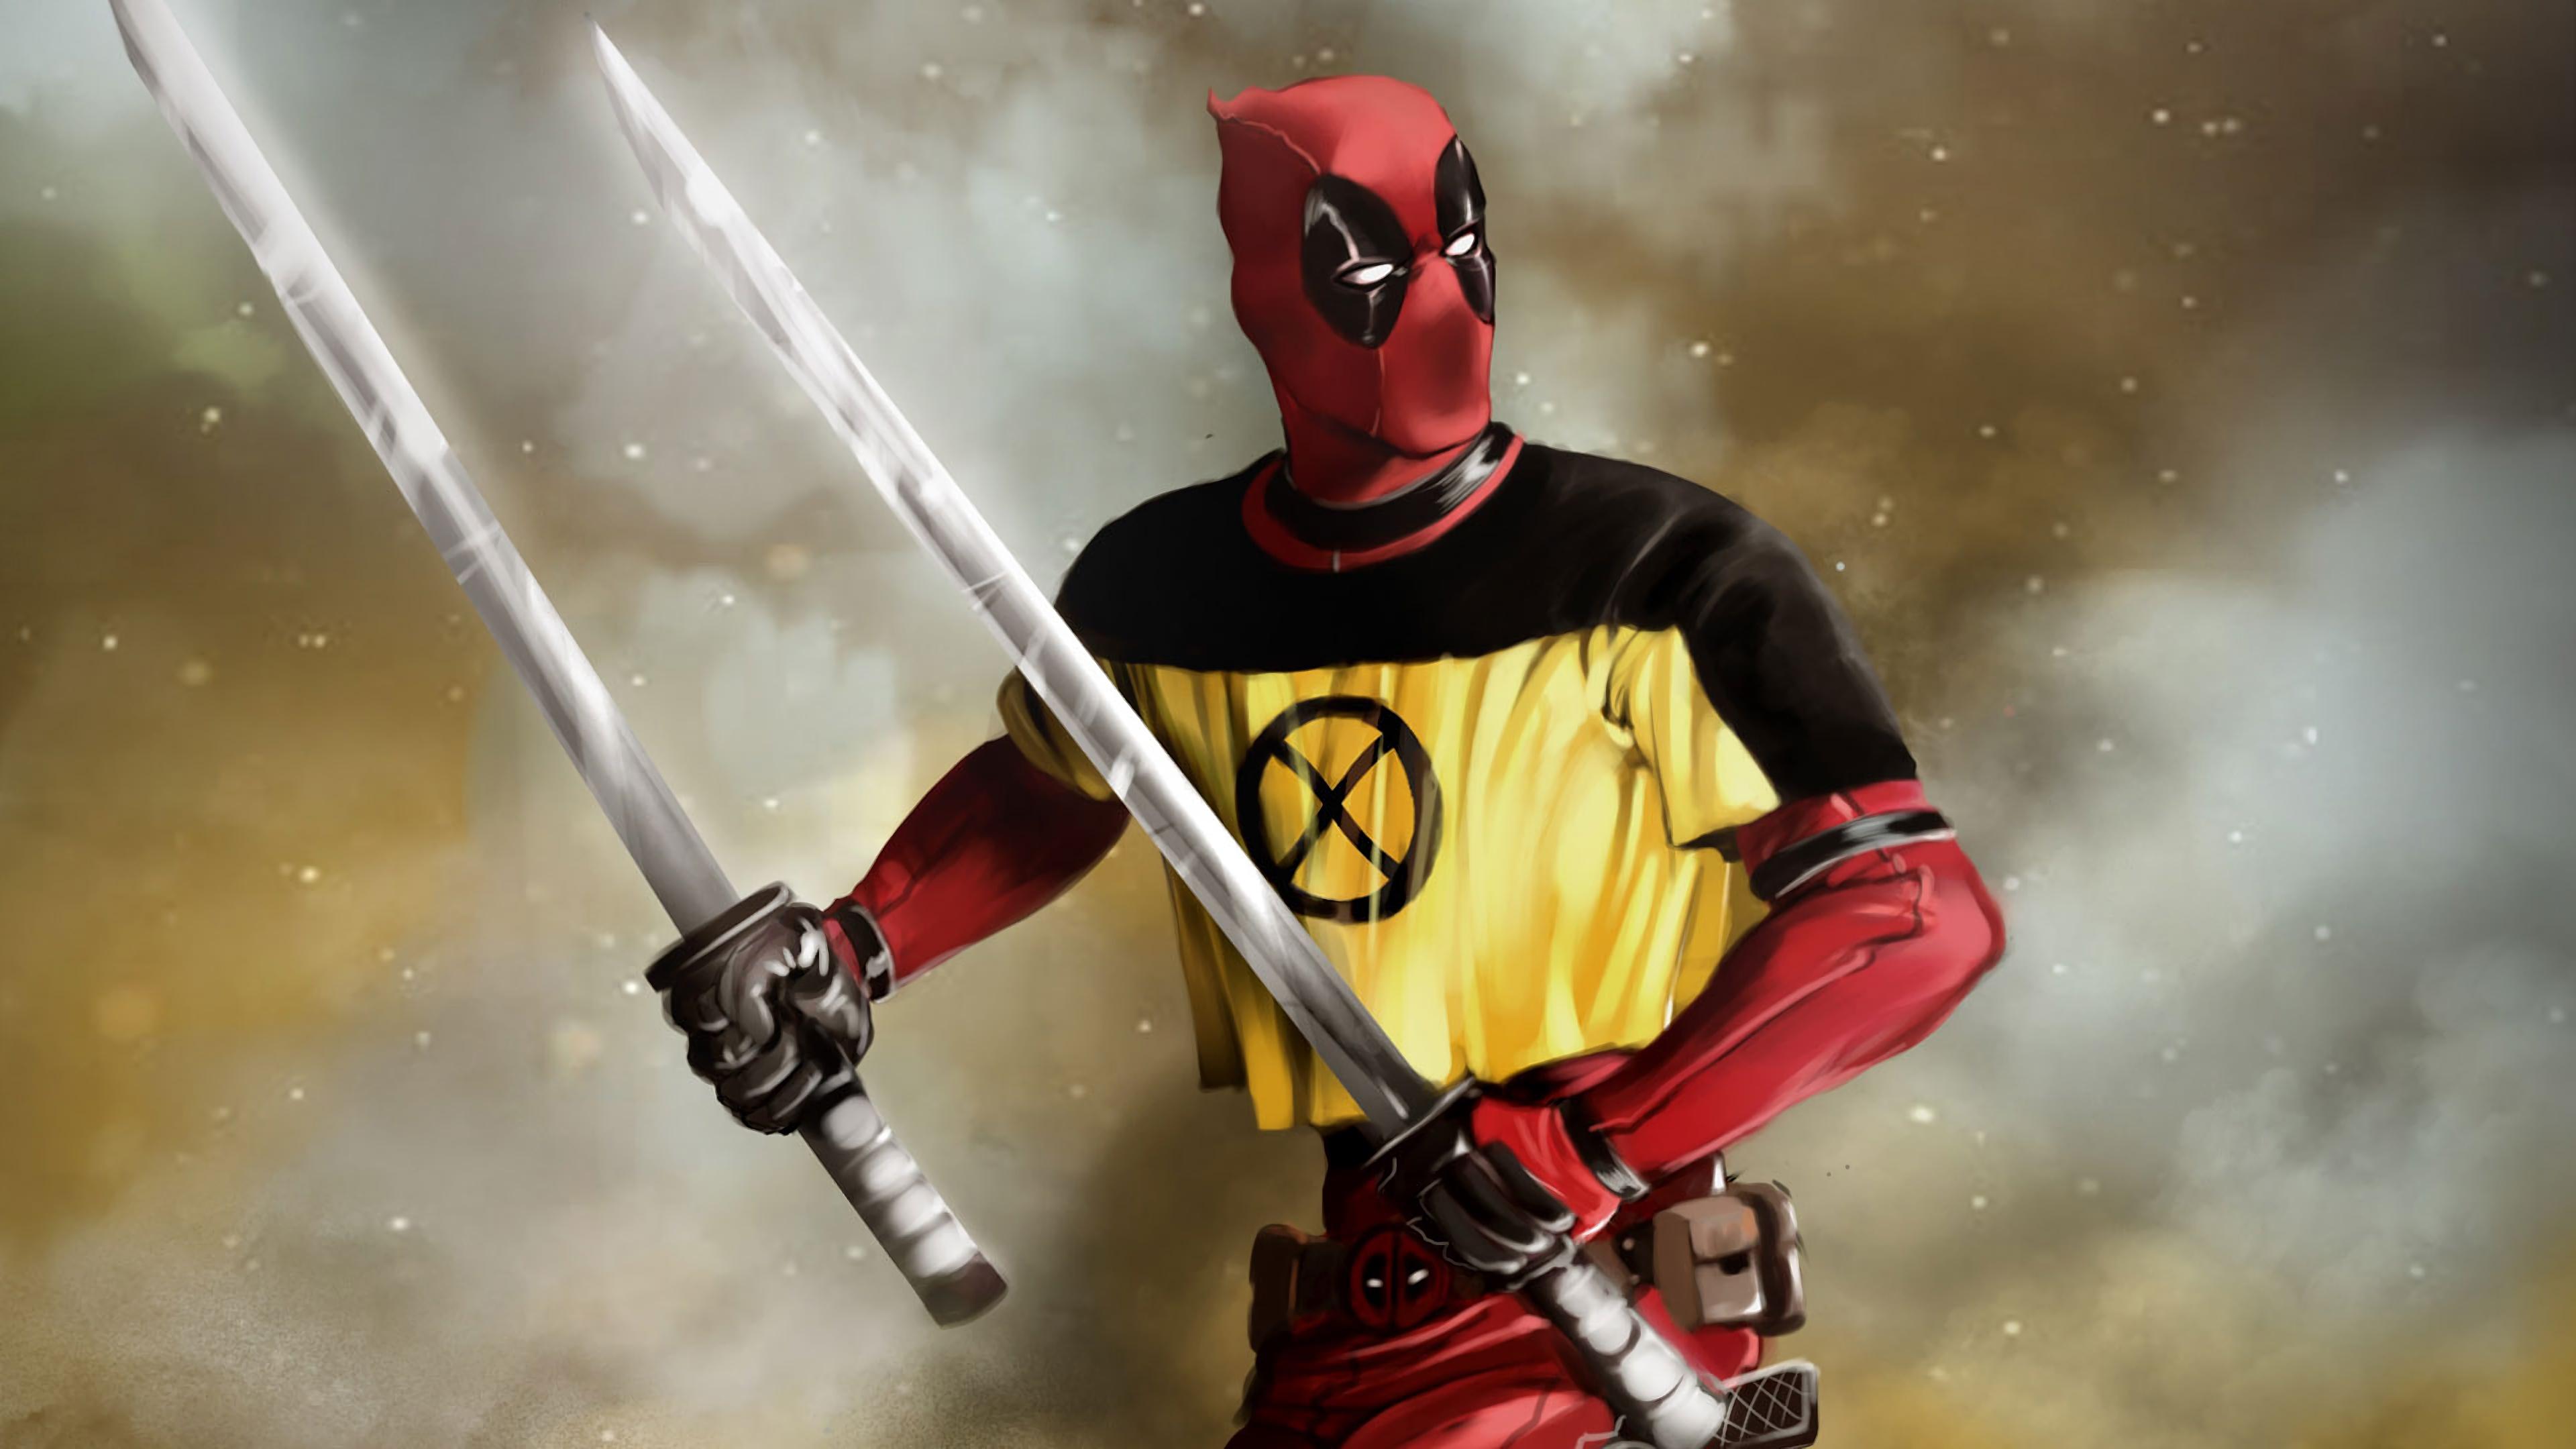 Deadpool 2 Movie Katana 4K Wallpaper